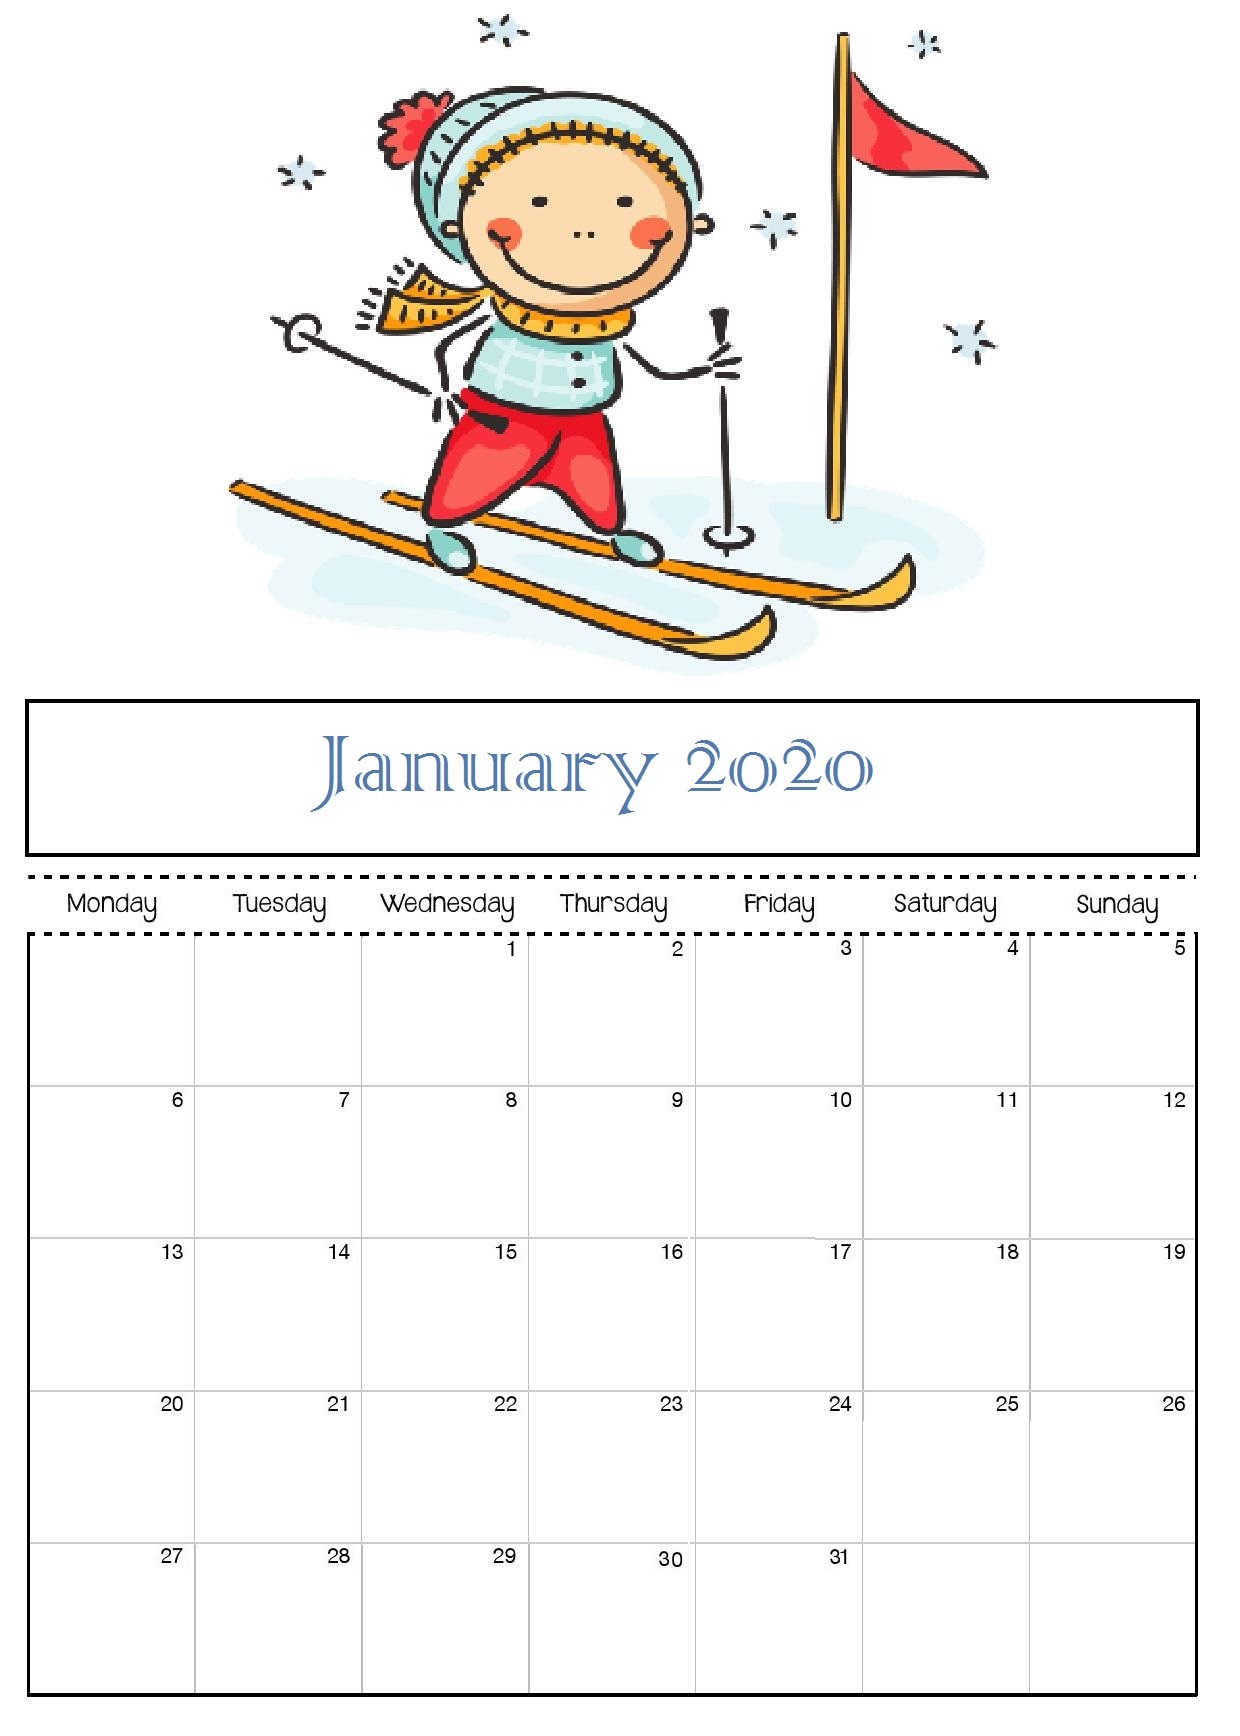 January 2020 Office Wall Calendar